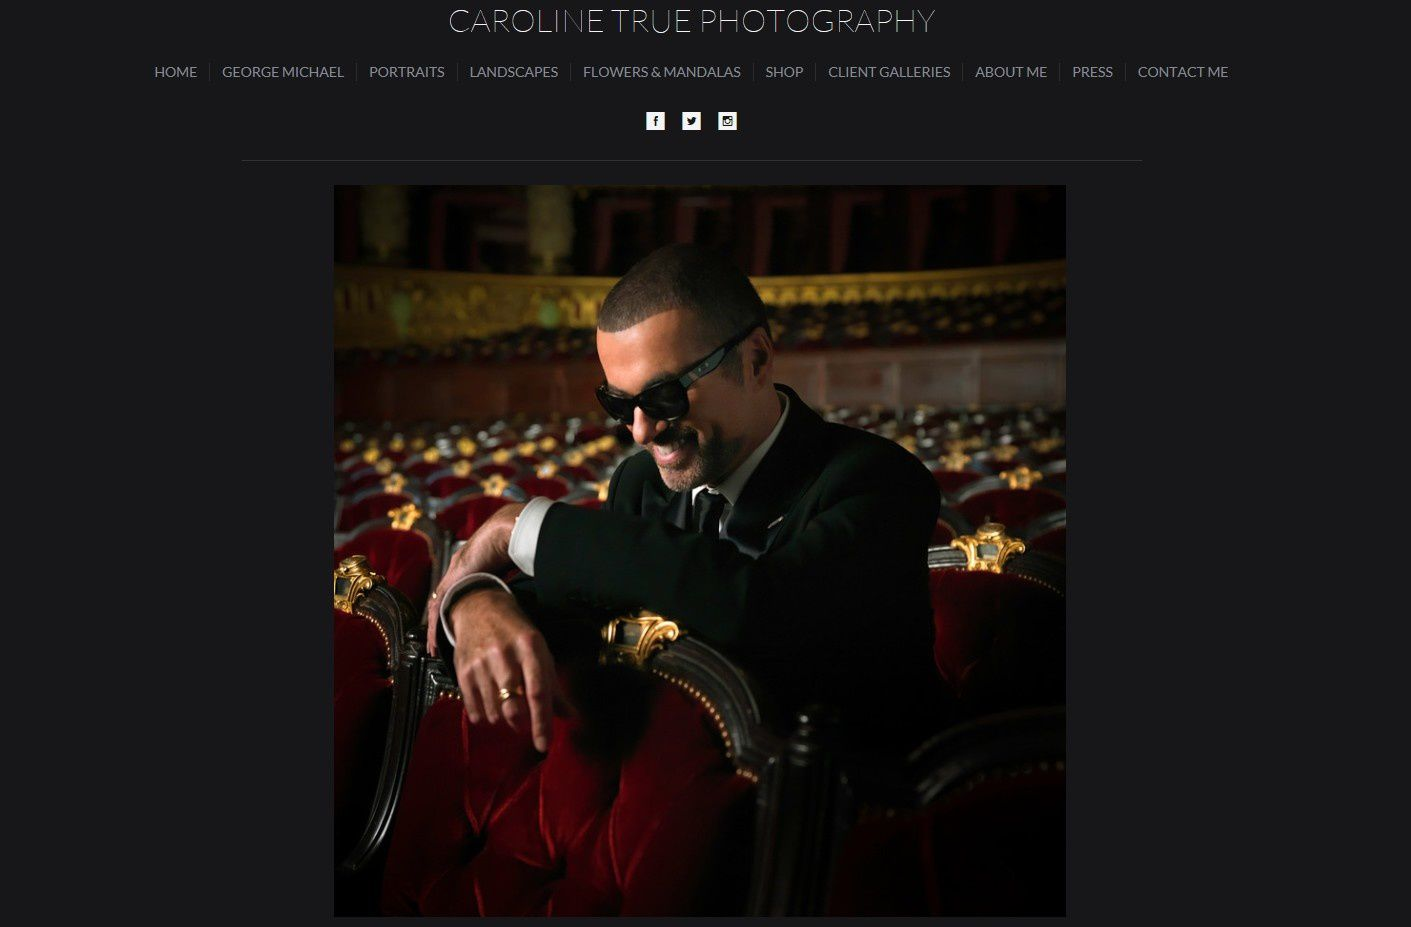 SYMPHONICA *LES PHOTOS DE CAROLINE TRUE EN VENTE *